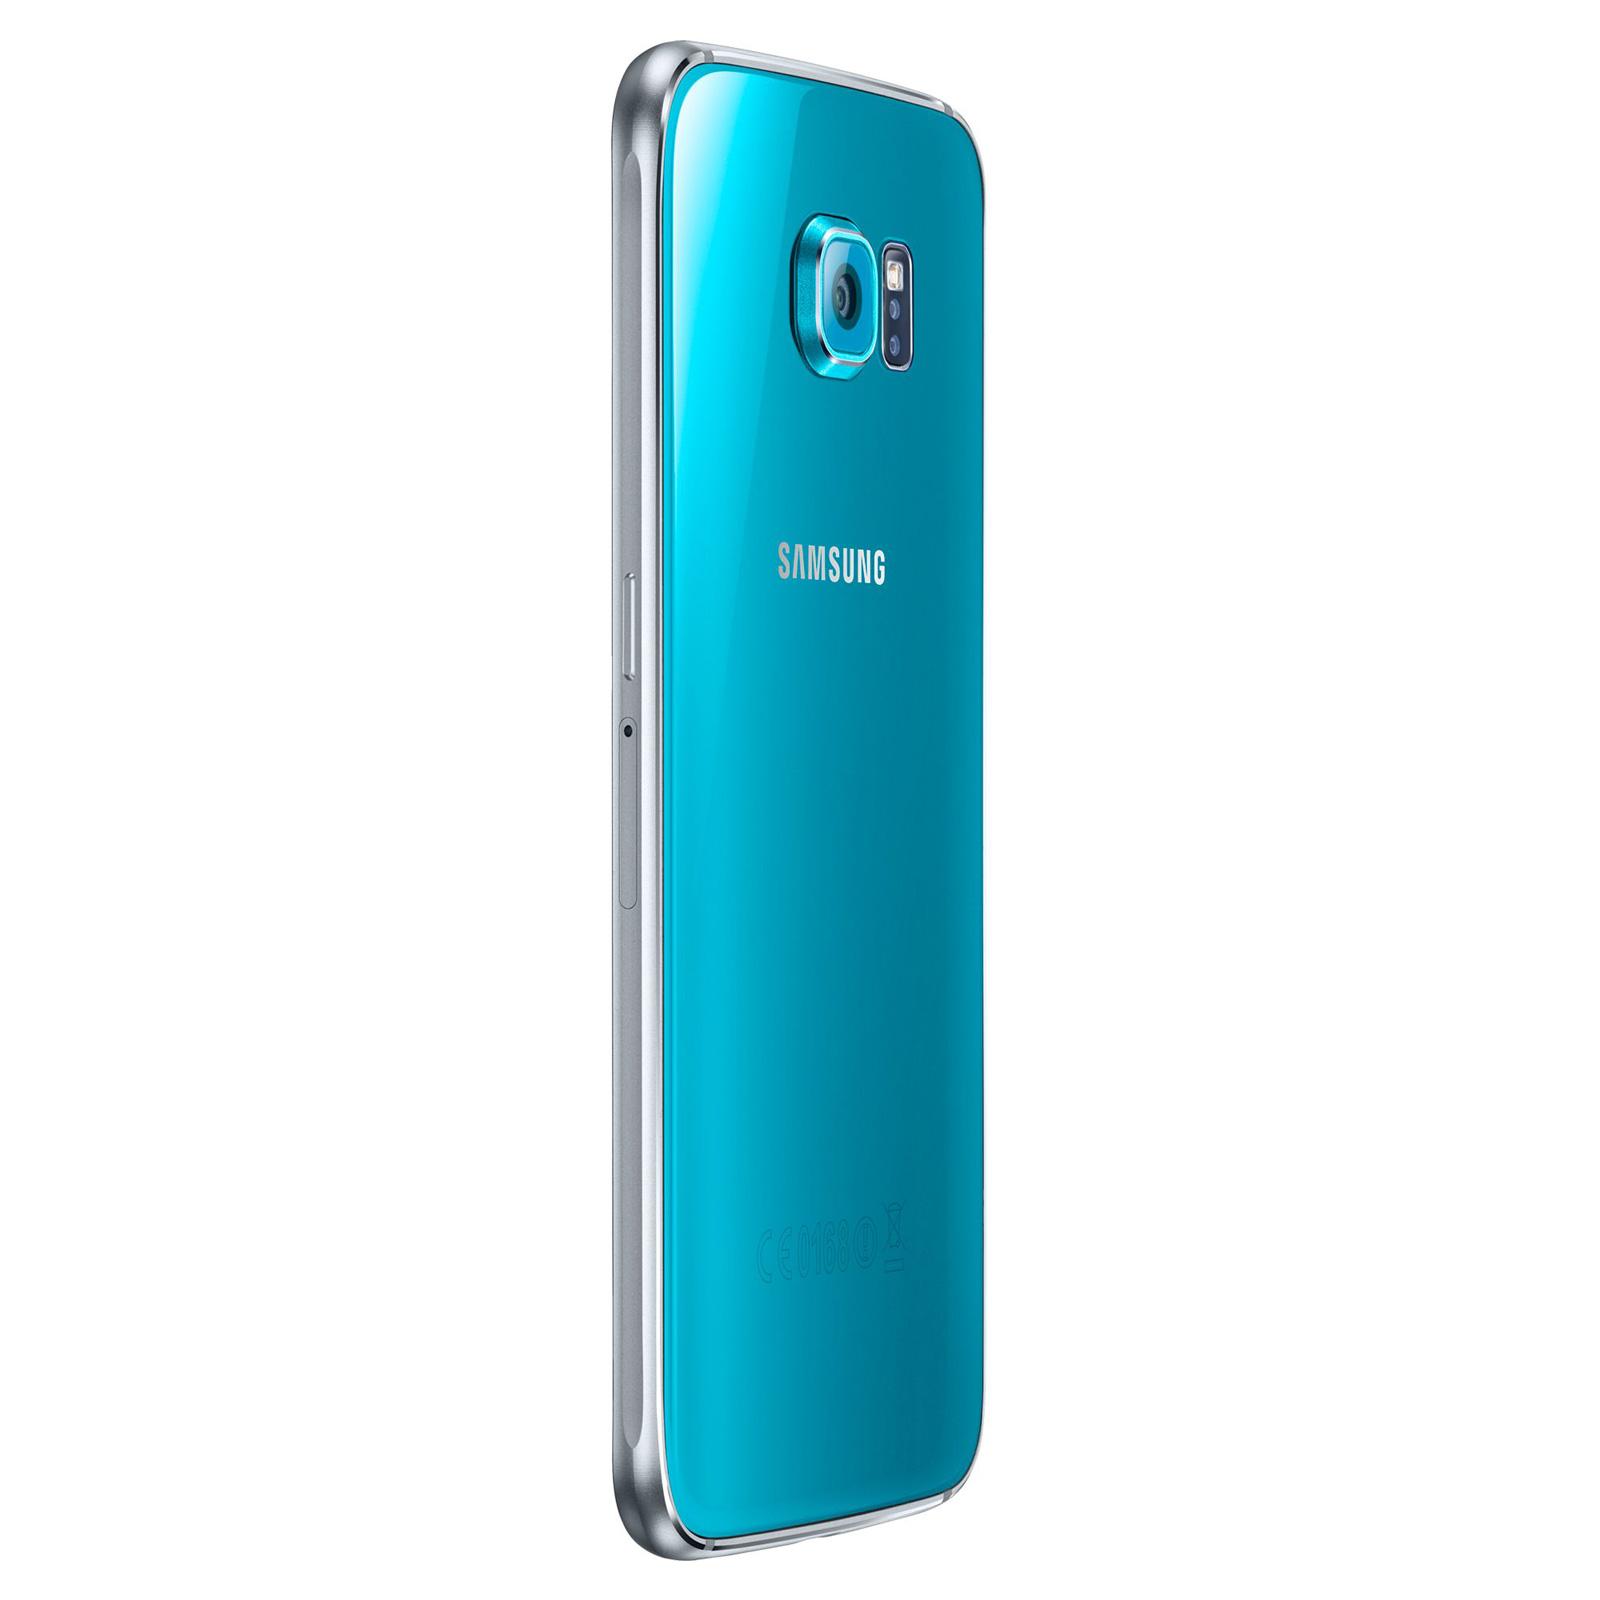 samsung galaxy s6 sm g920f bleu 32 go mobile smartphone samsung sur. Black Bedroom Furniture Sets. Home Design Ideas